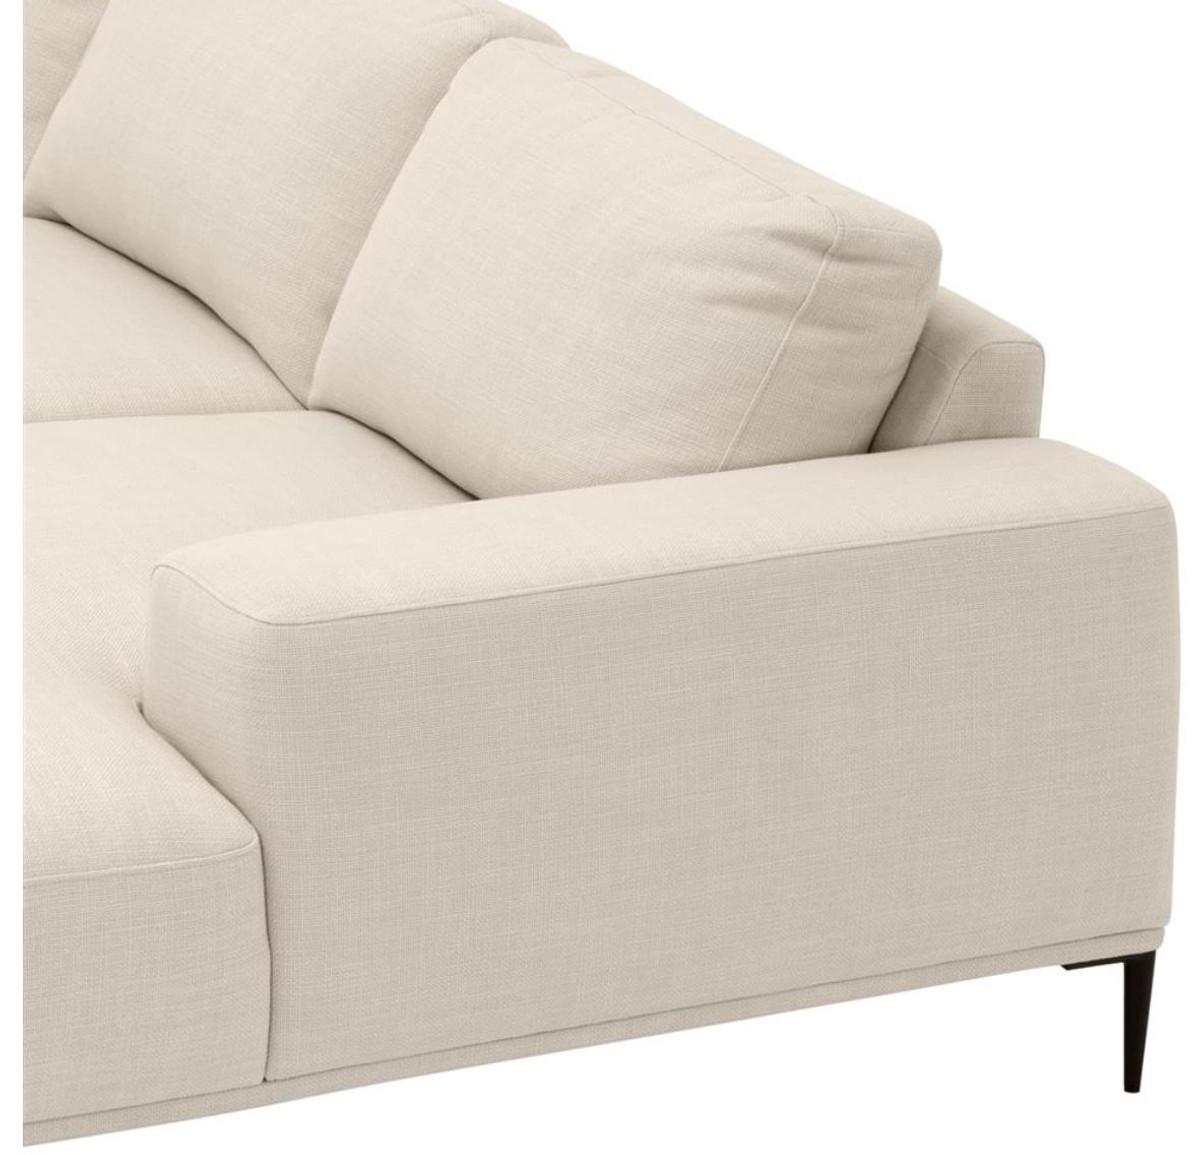 casa padrino luxus lounge sofa naturfarbig 285 x 164 x h 80 cm luxus kollektion sofas luxus. Black Bedroom Furniture Sets. Home Design Ideas